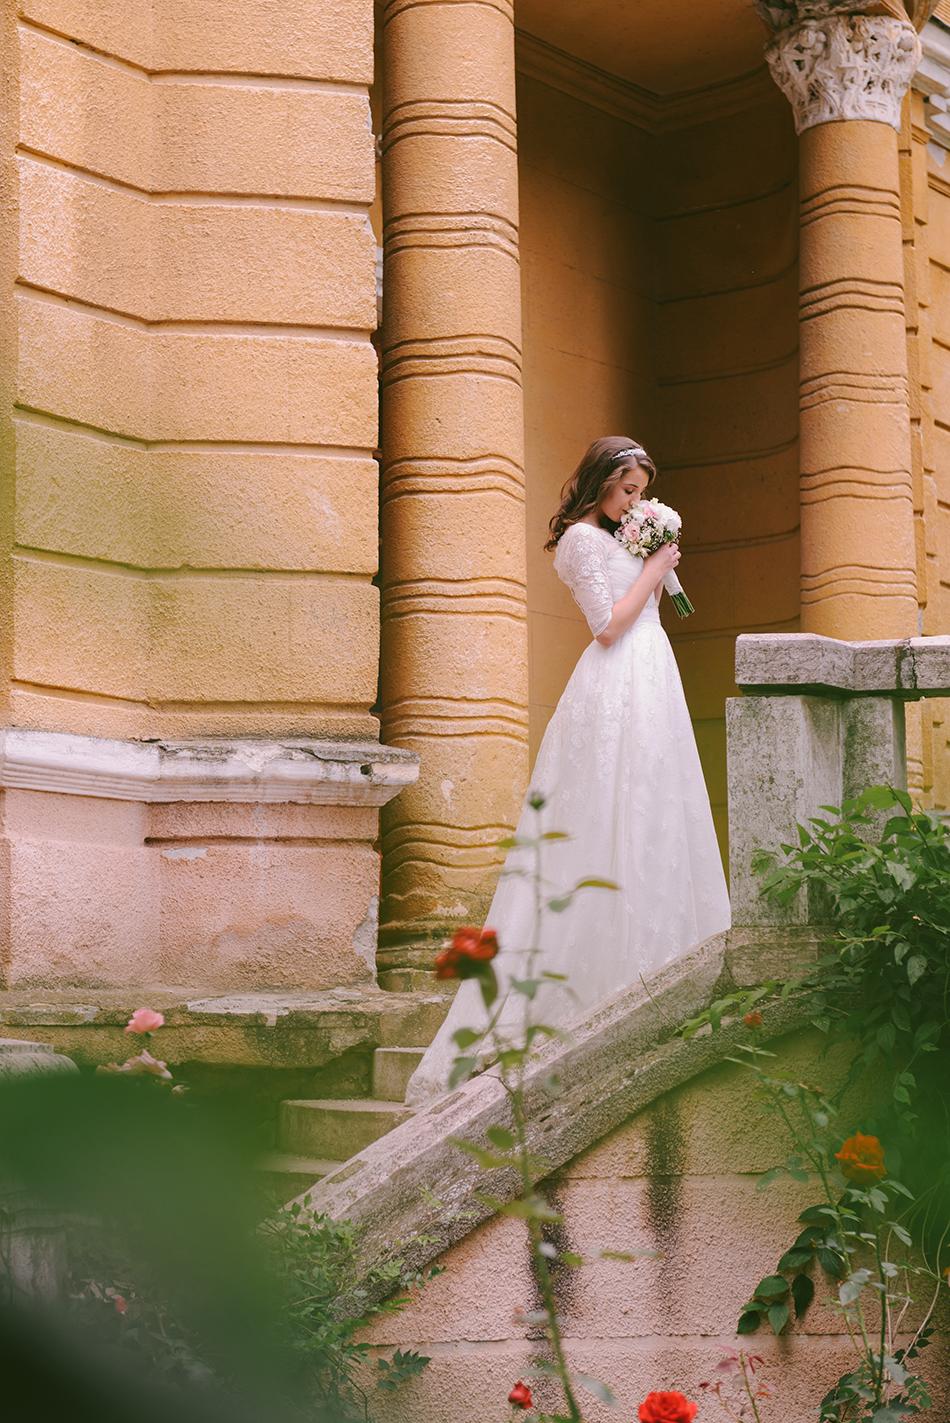 AD Passion Photography | sami-ela-lela-nunta-domeniu-lupas-arad_0061 | Adelin, Dida, fotograf profesionist, fotograf de nunta, fotografie de nunta, fotograf Timisoara, fotograf Craiova, fotograf Bucuresti, fotograf Arad, nunta Timisoara, nunta Arad, nunta Bucuresti, nunta Craiova